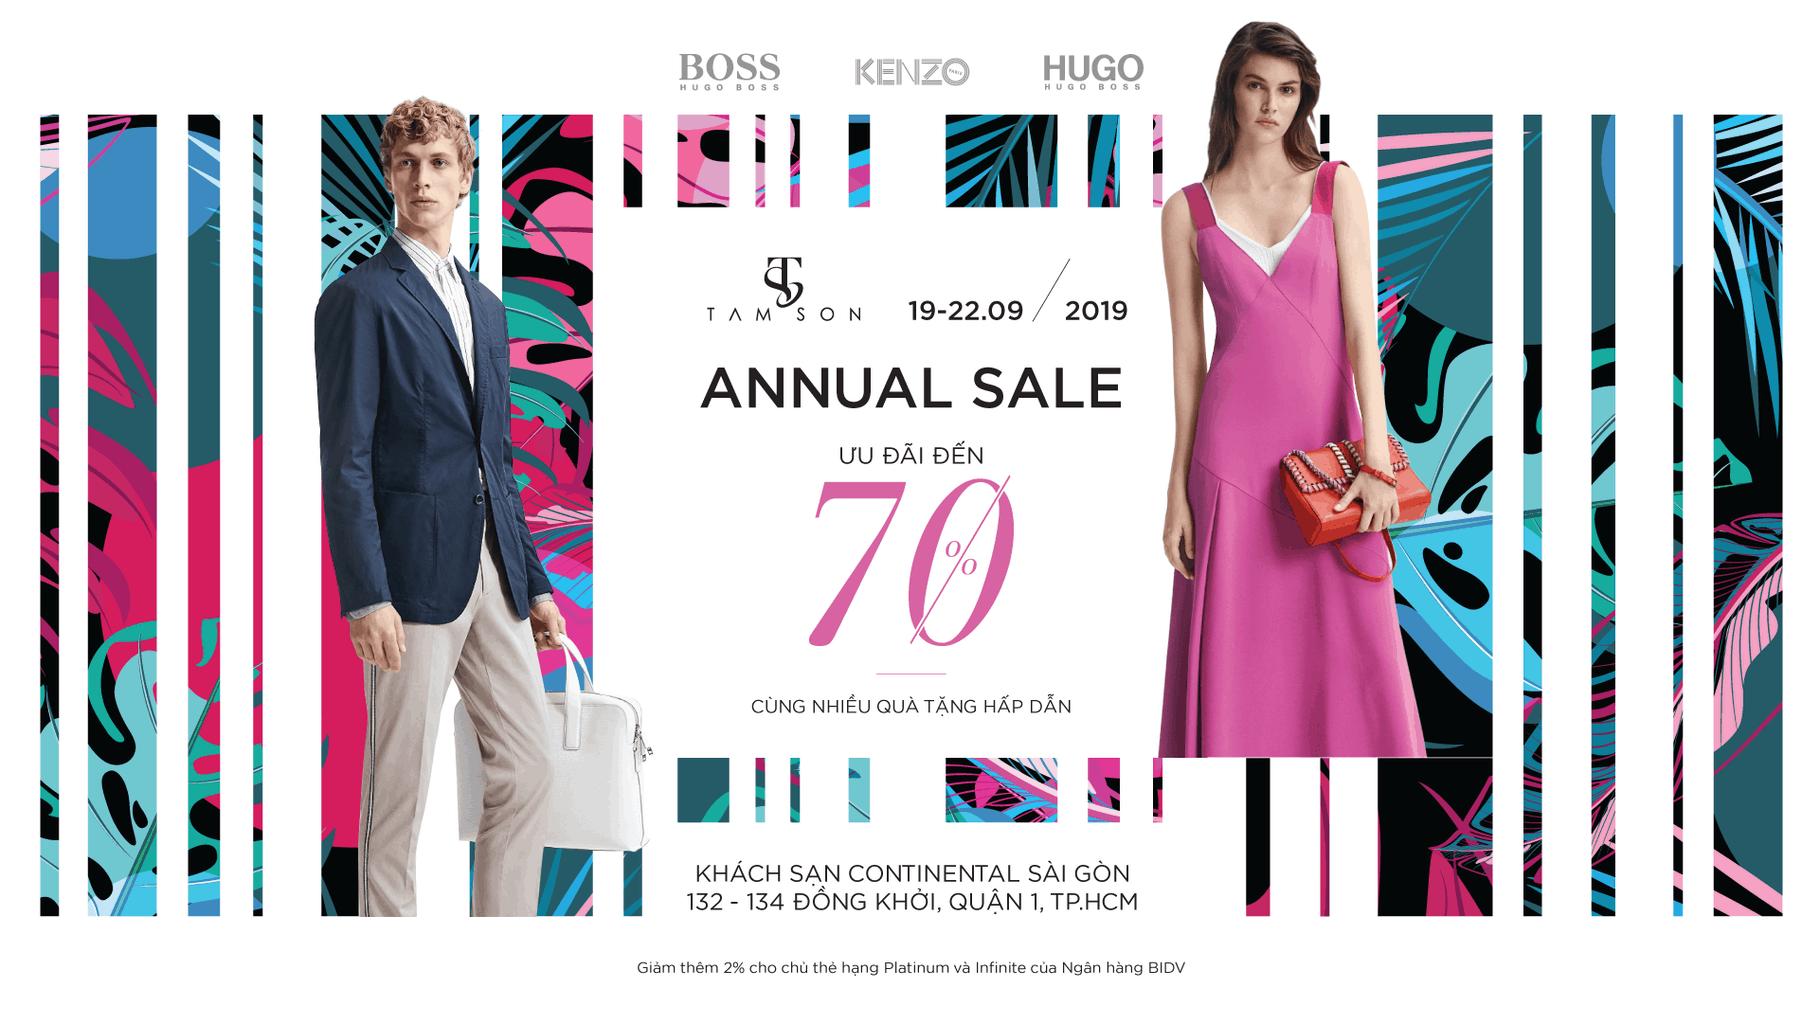 Tamson Annual Sale: Saint Laurent, Bottega Veneta, Hugo, Boss, Kenzo Giảm Giá Tới 70% 1